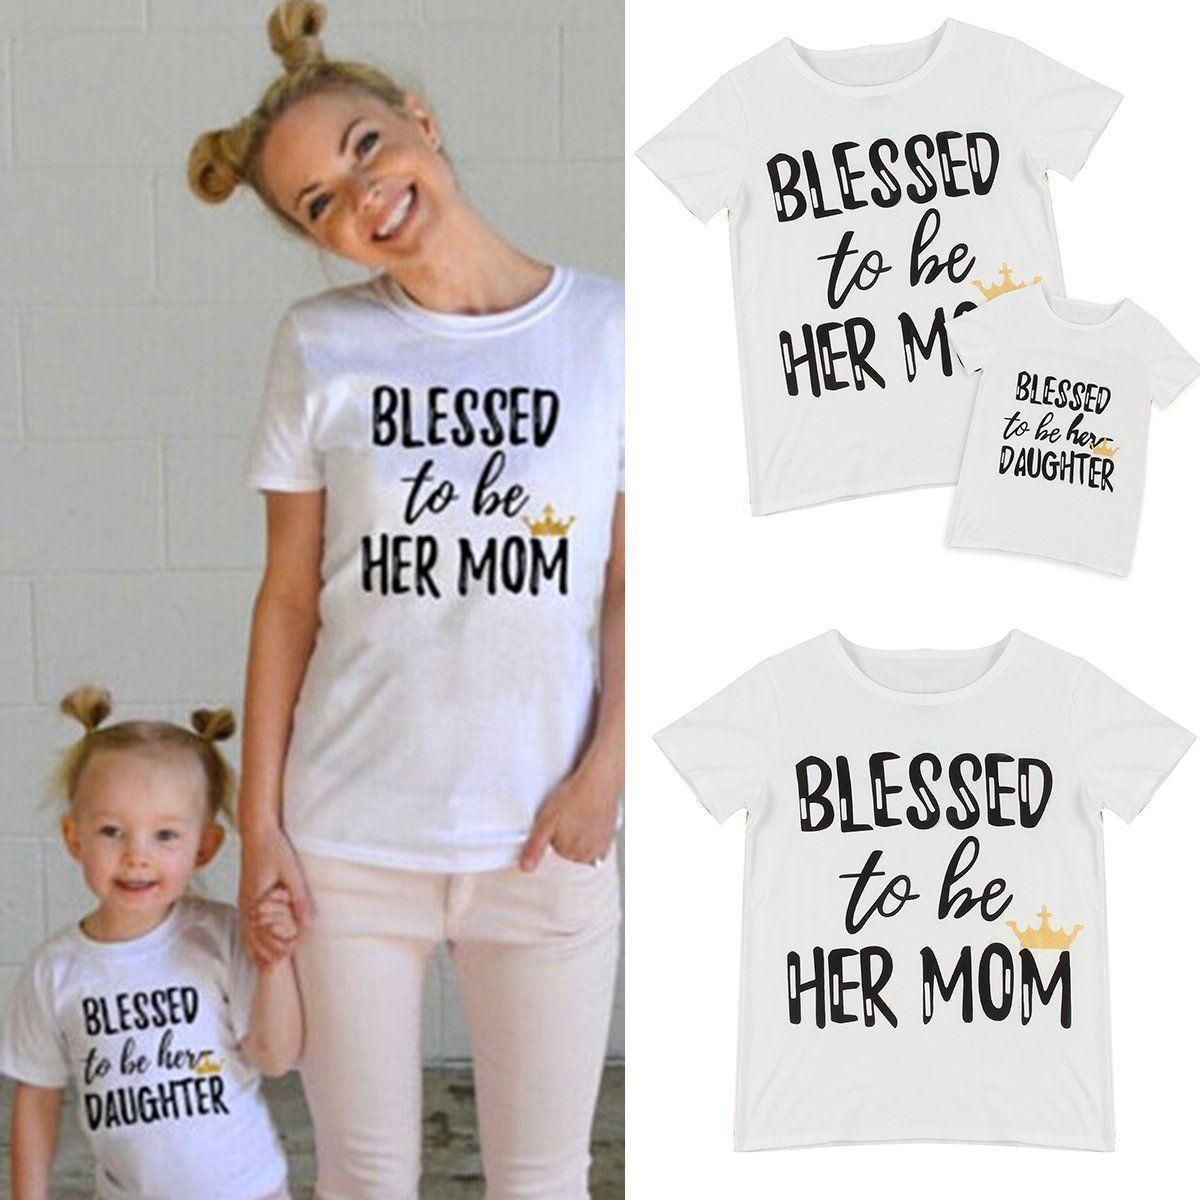 edda801c55 Family T-Shirt Mother Daughter Short Sleeve Summer Cotton Tee Shirt Top  Clothing